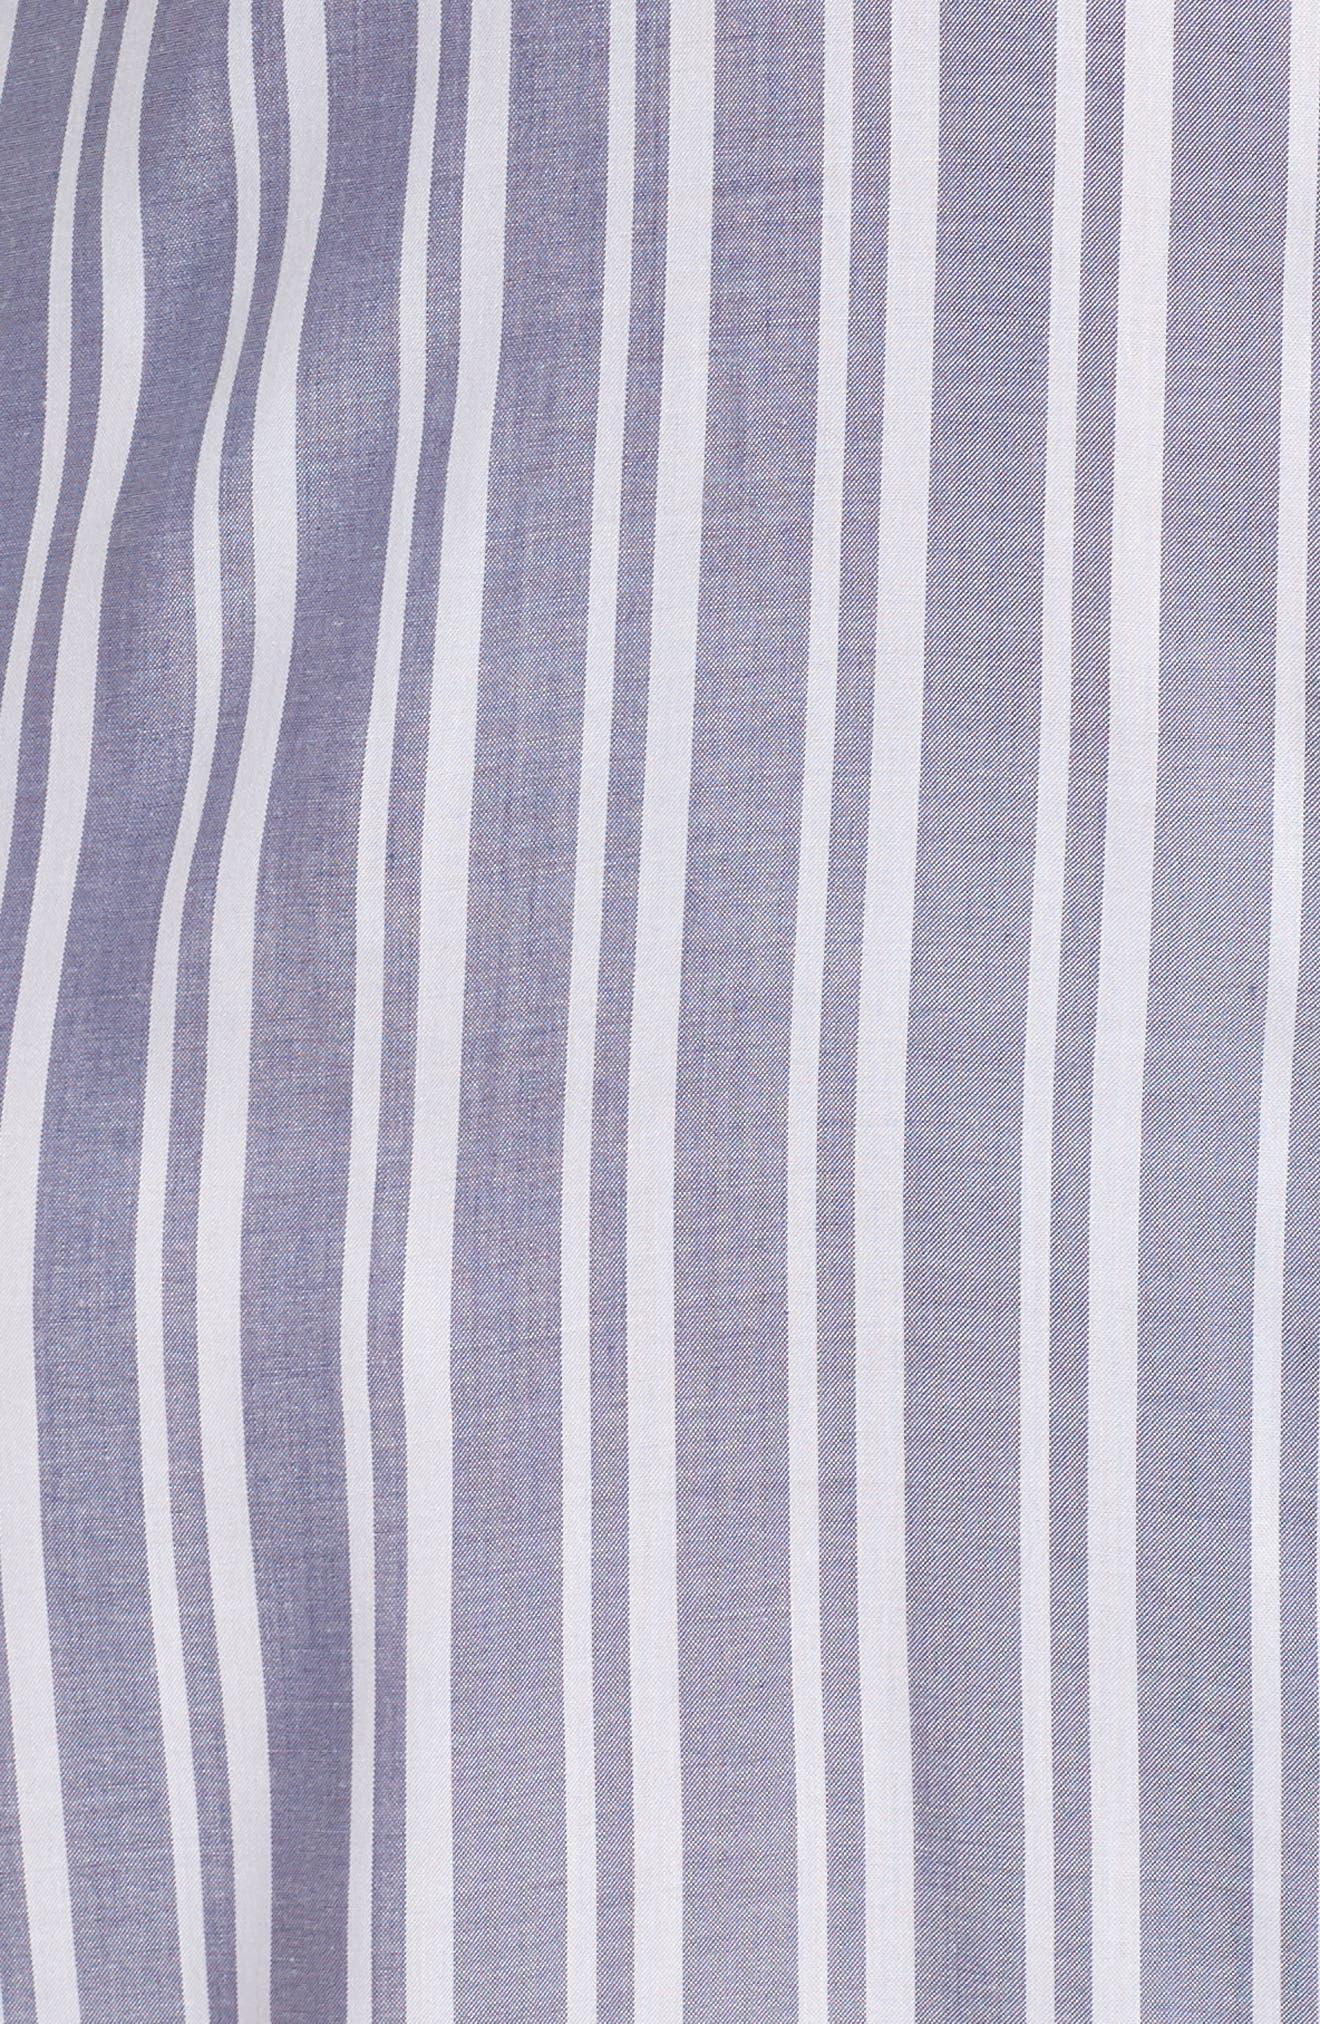 Woven Caftan,                             Alternate thumbnail 5, color,                             Blue Indigo Preppy Stripe